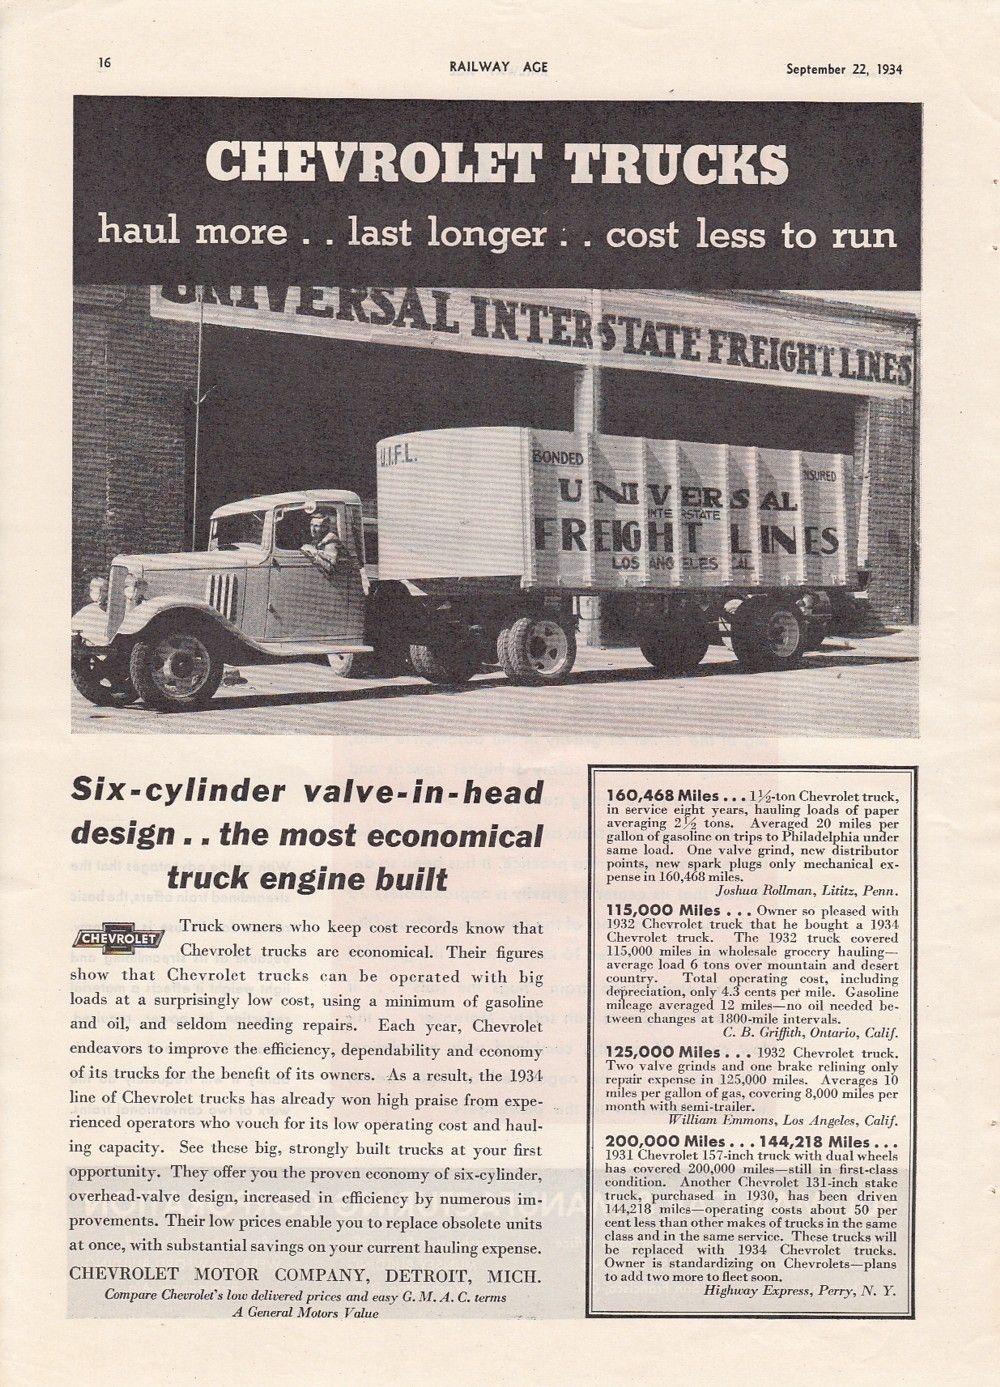 1934 Chevrolet Motor Co Ad Chevy Truck Universal Freight Lines Los Angeles Ca Ebay Chevy Trucks Chevrolet Trucks